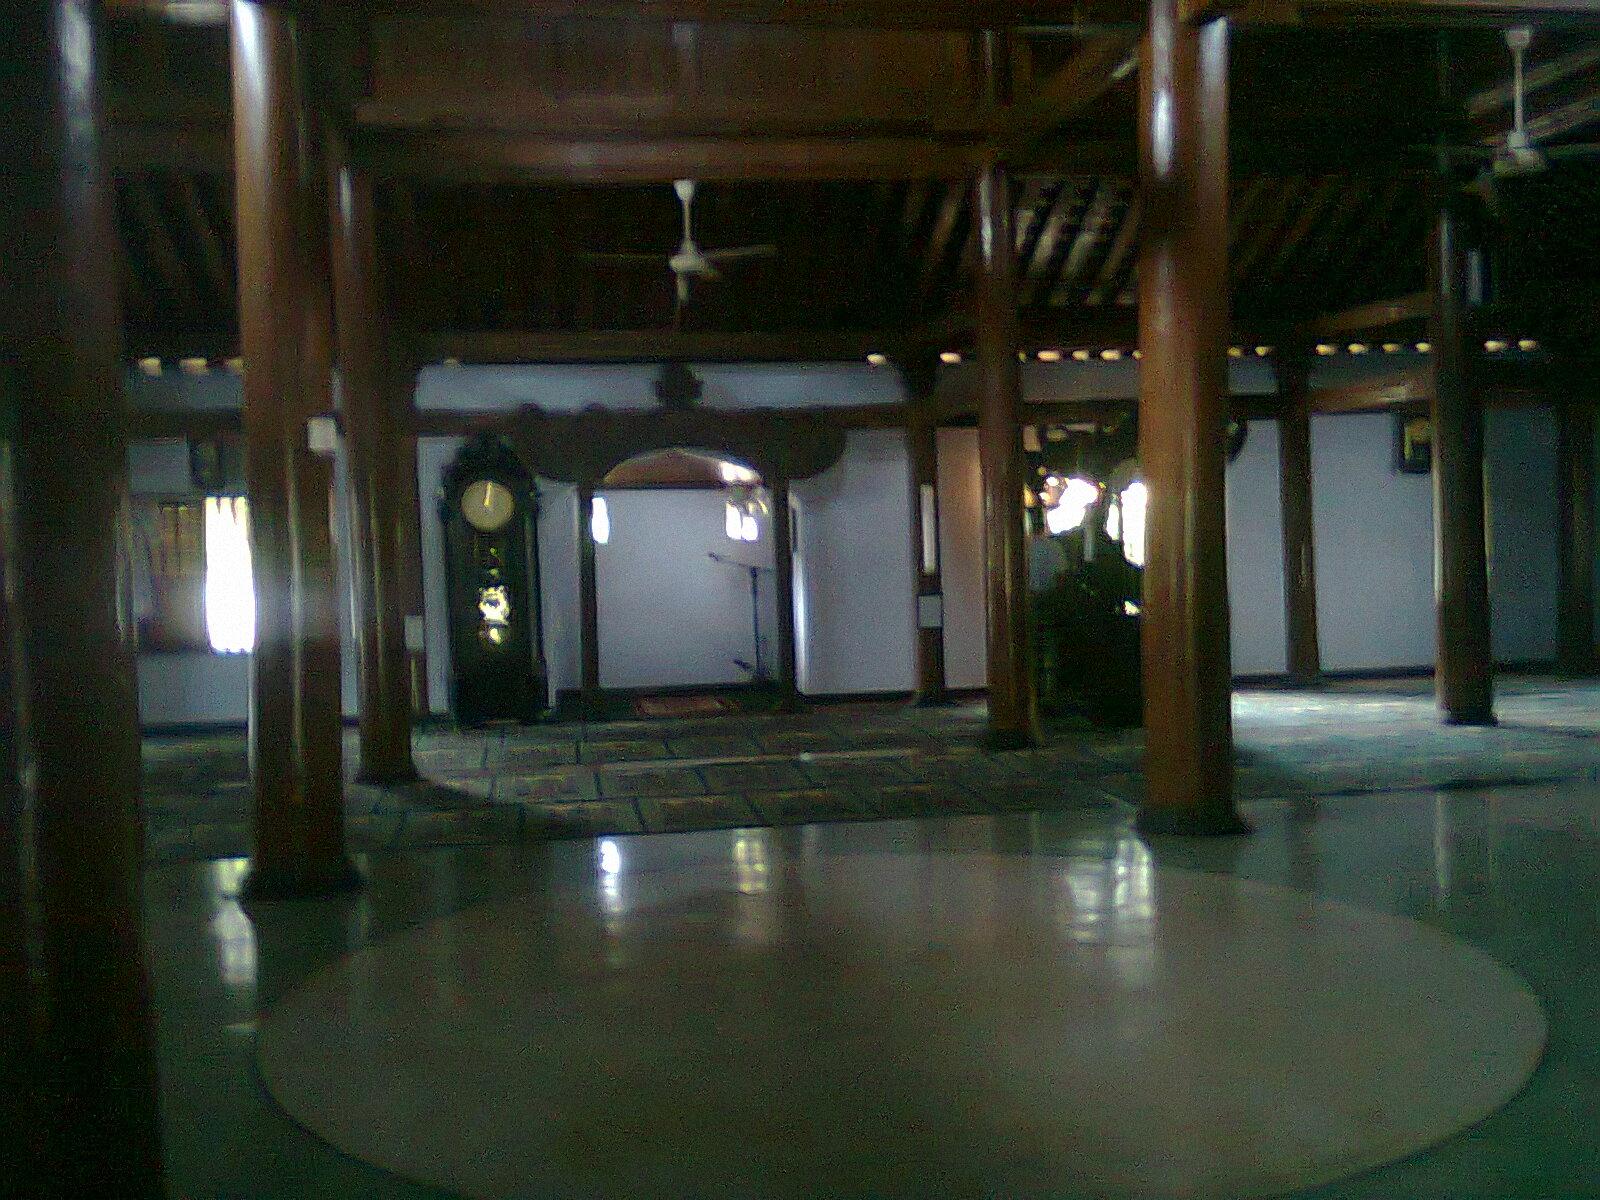 Masjid Tegalsari Ponorogo Bumi Nusantara Agung Kota Kab